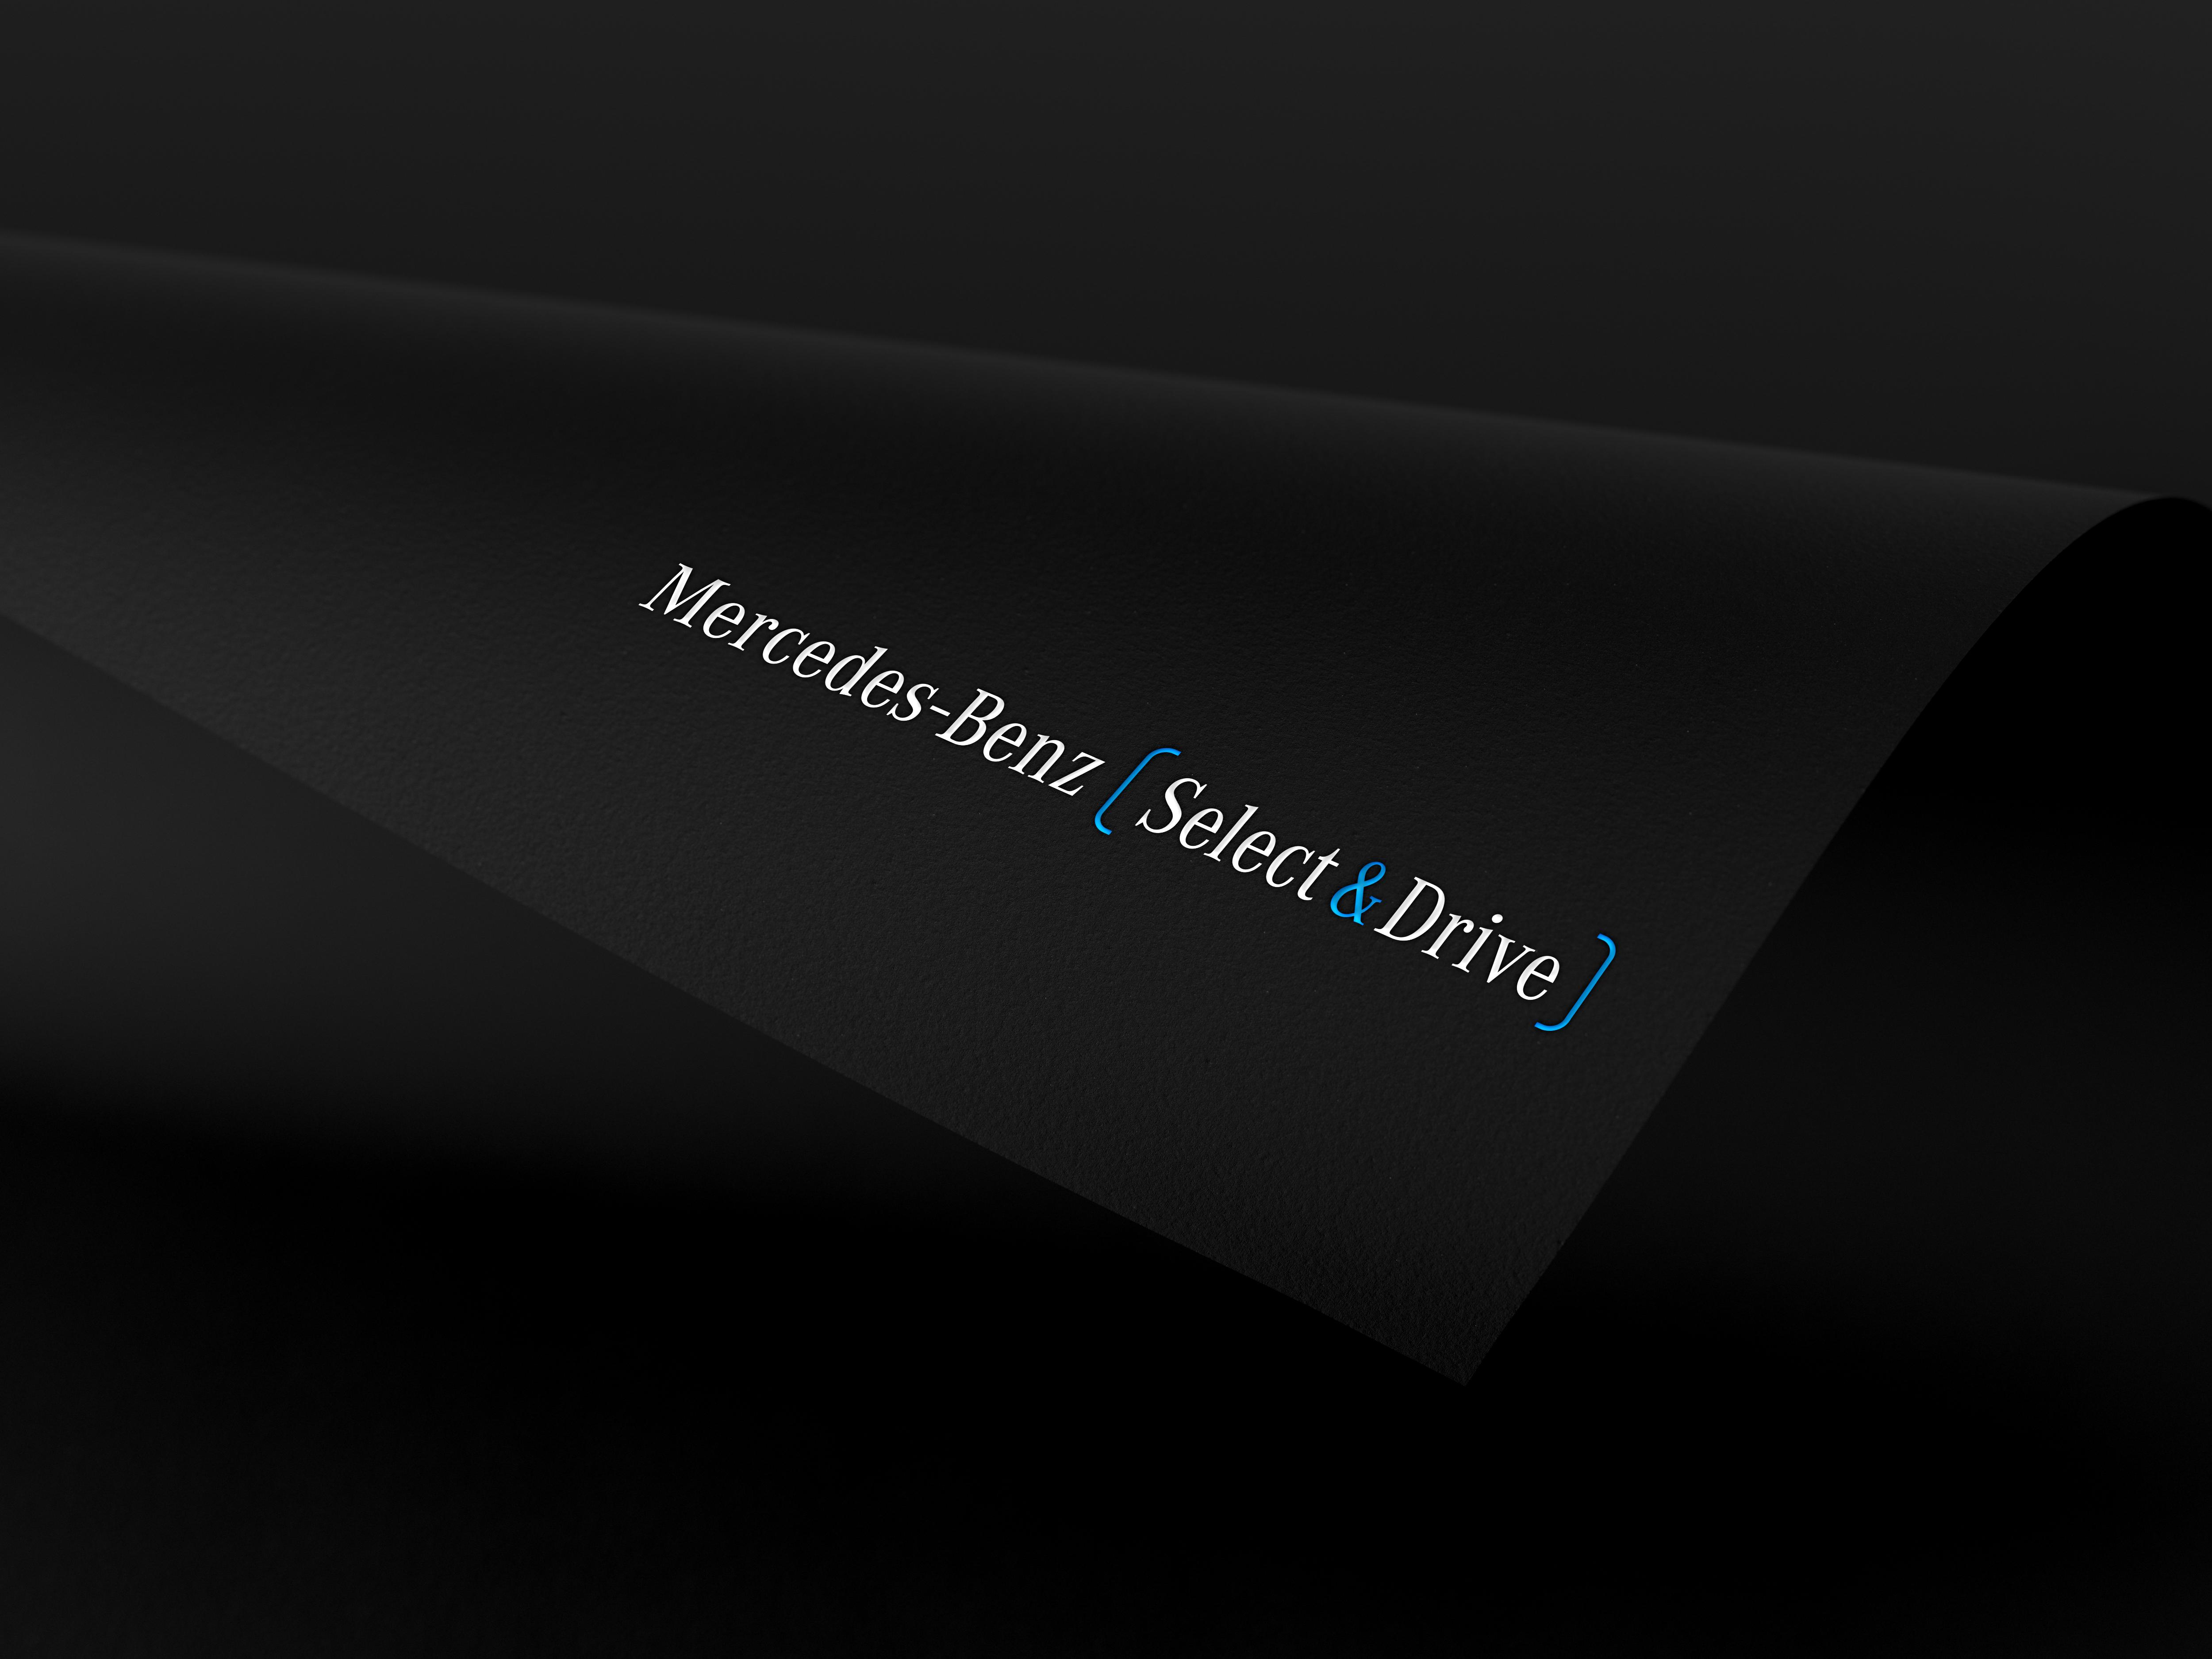 Page_SelectDrive